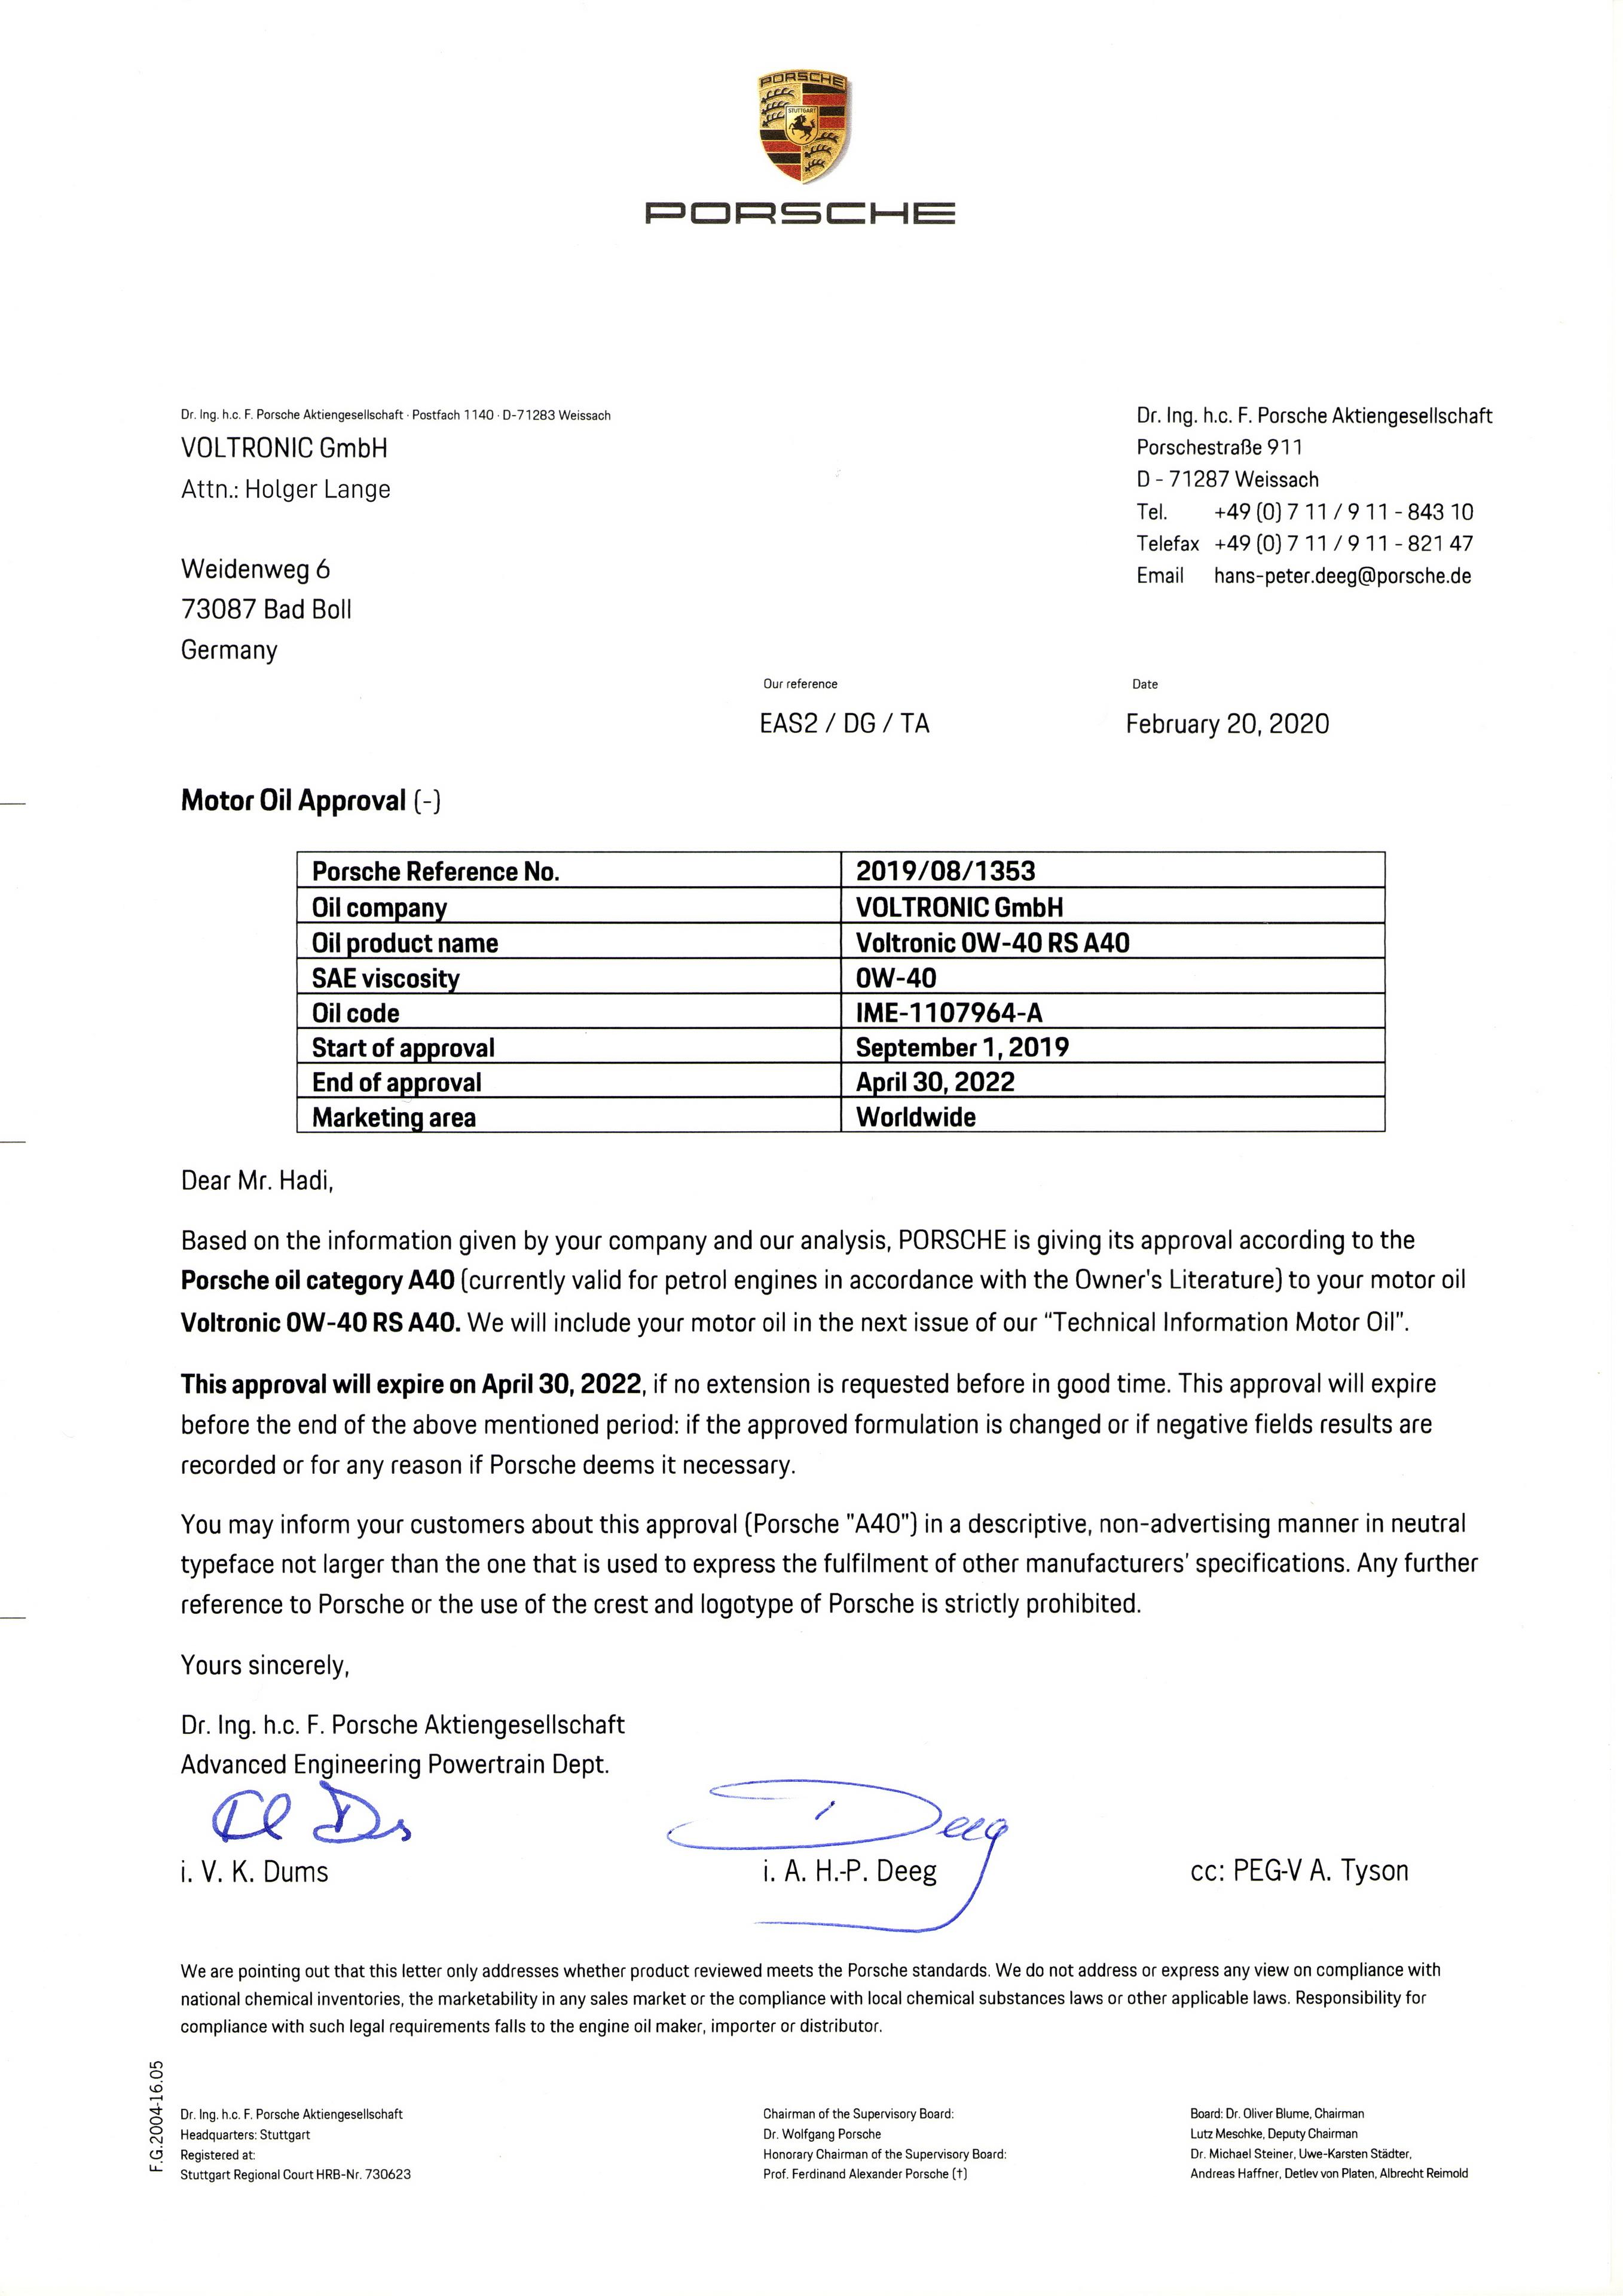 VOLTRONIC 0W40 GT-RS PORSCHE A40 Approval